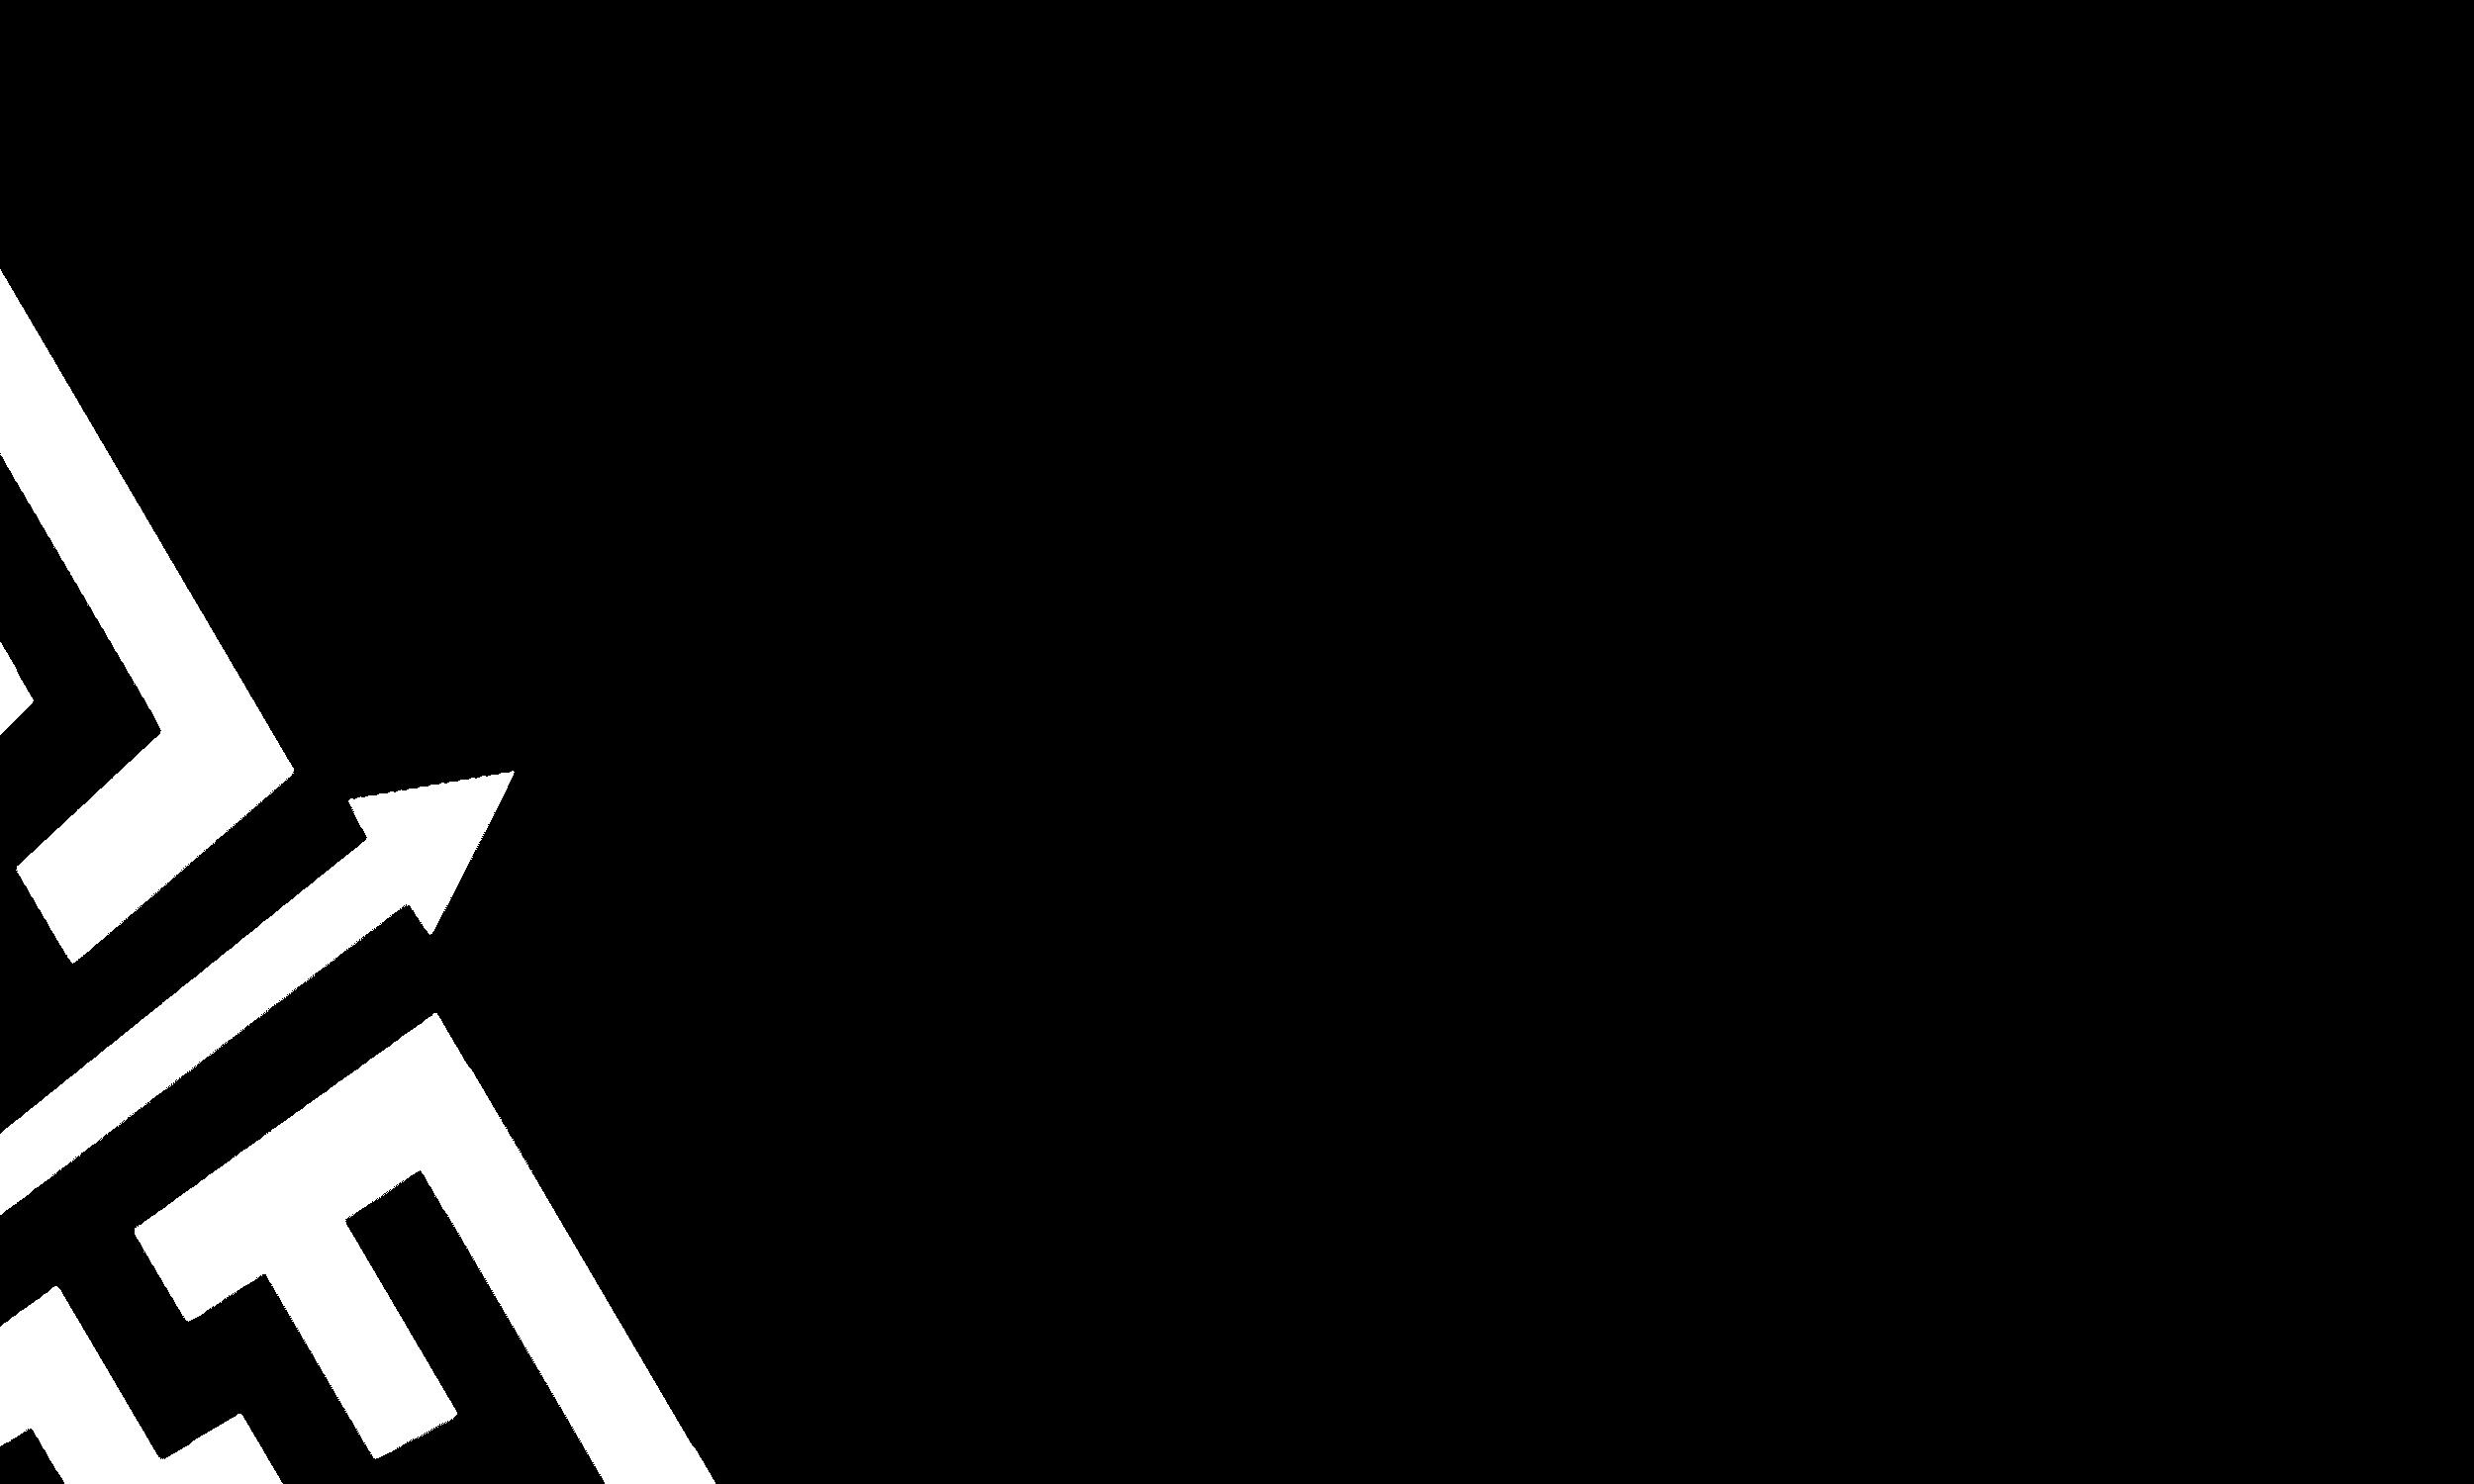 Webreg watermark